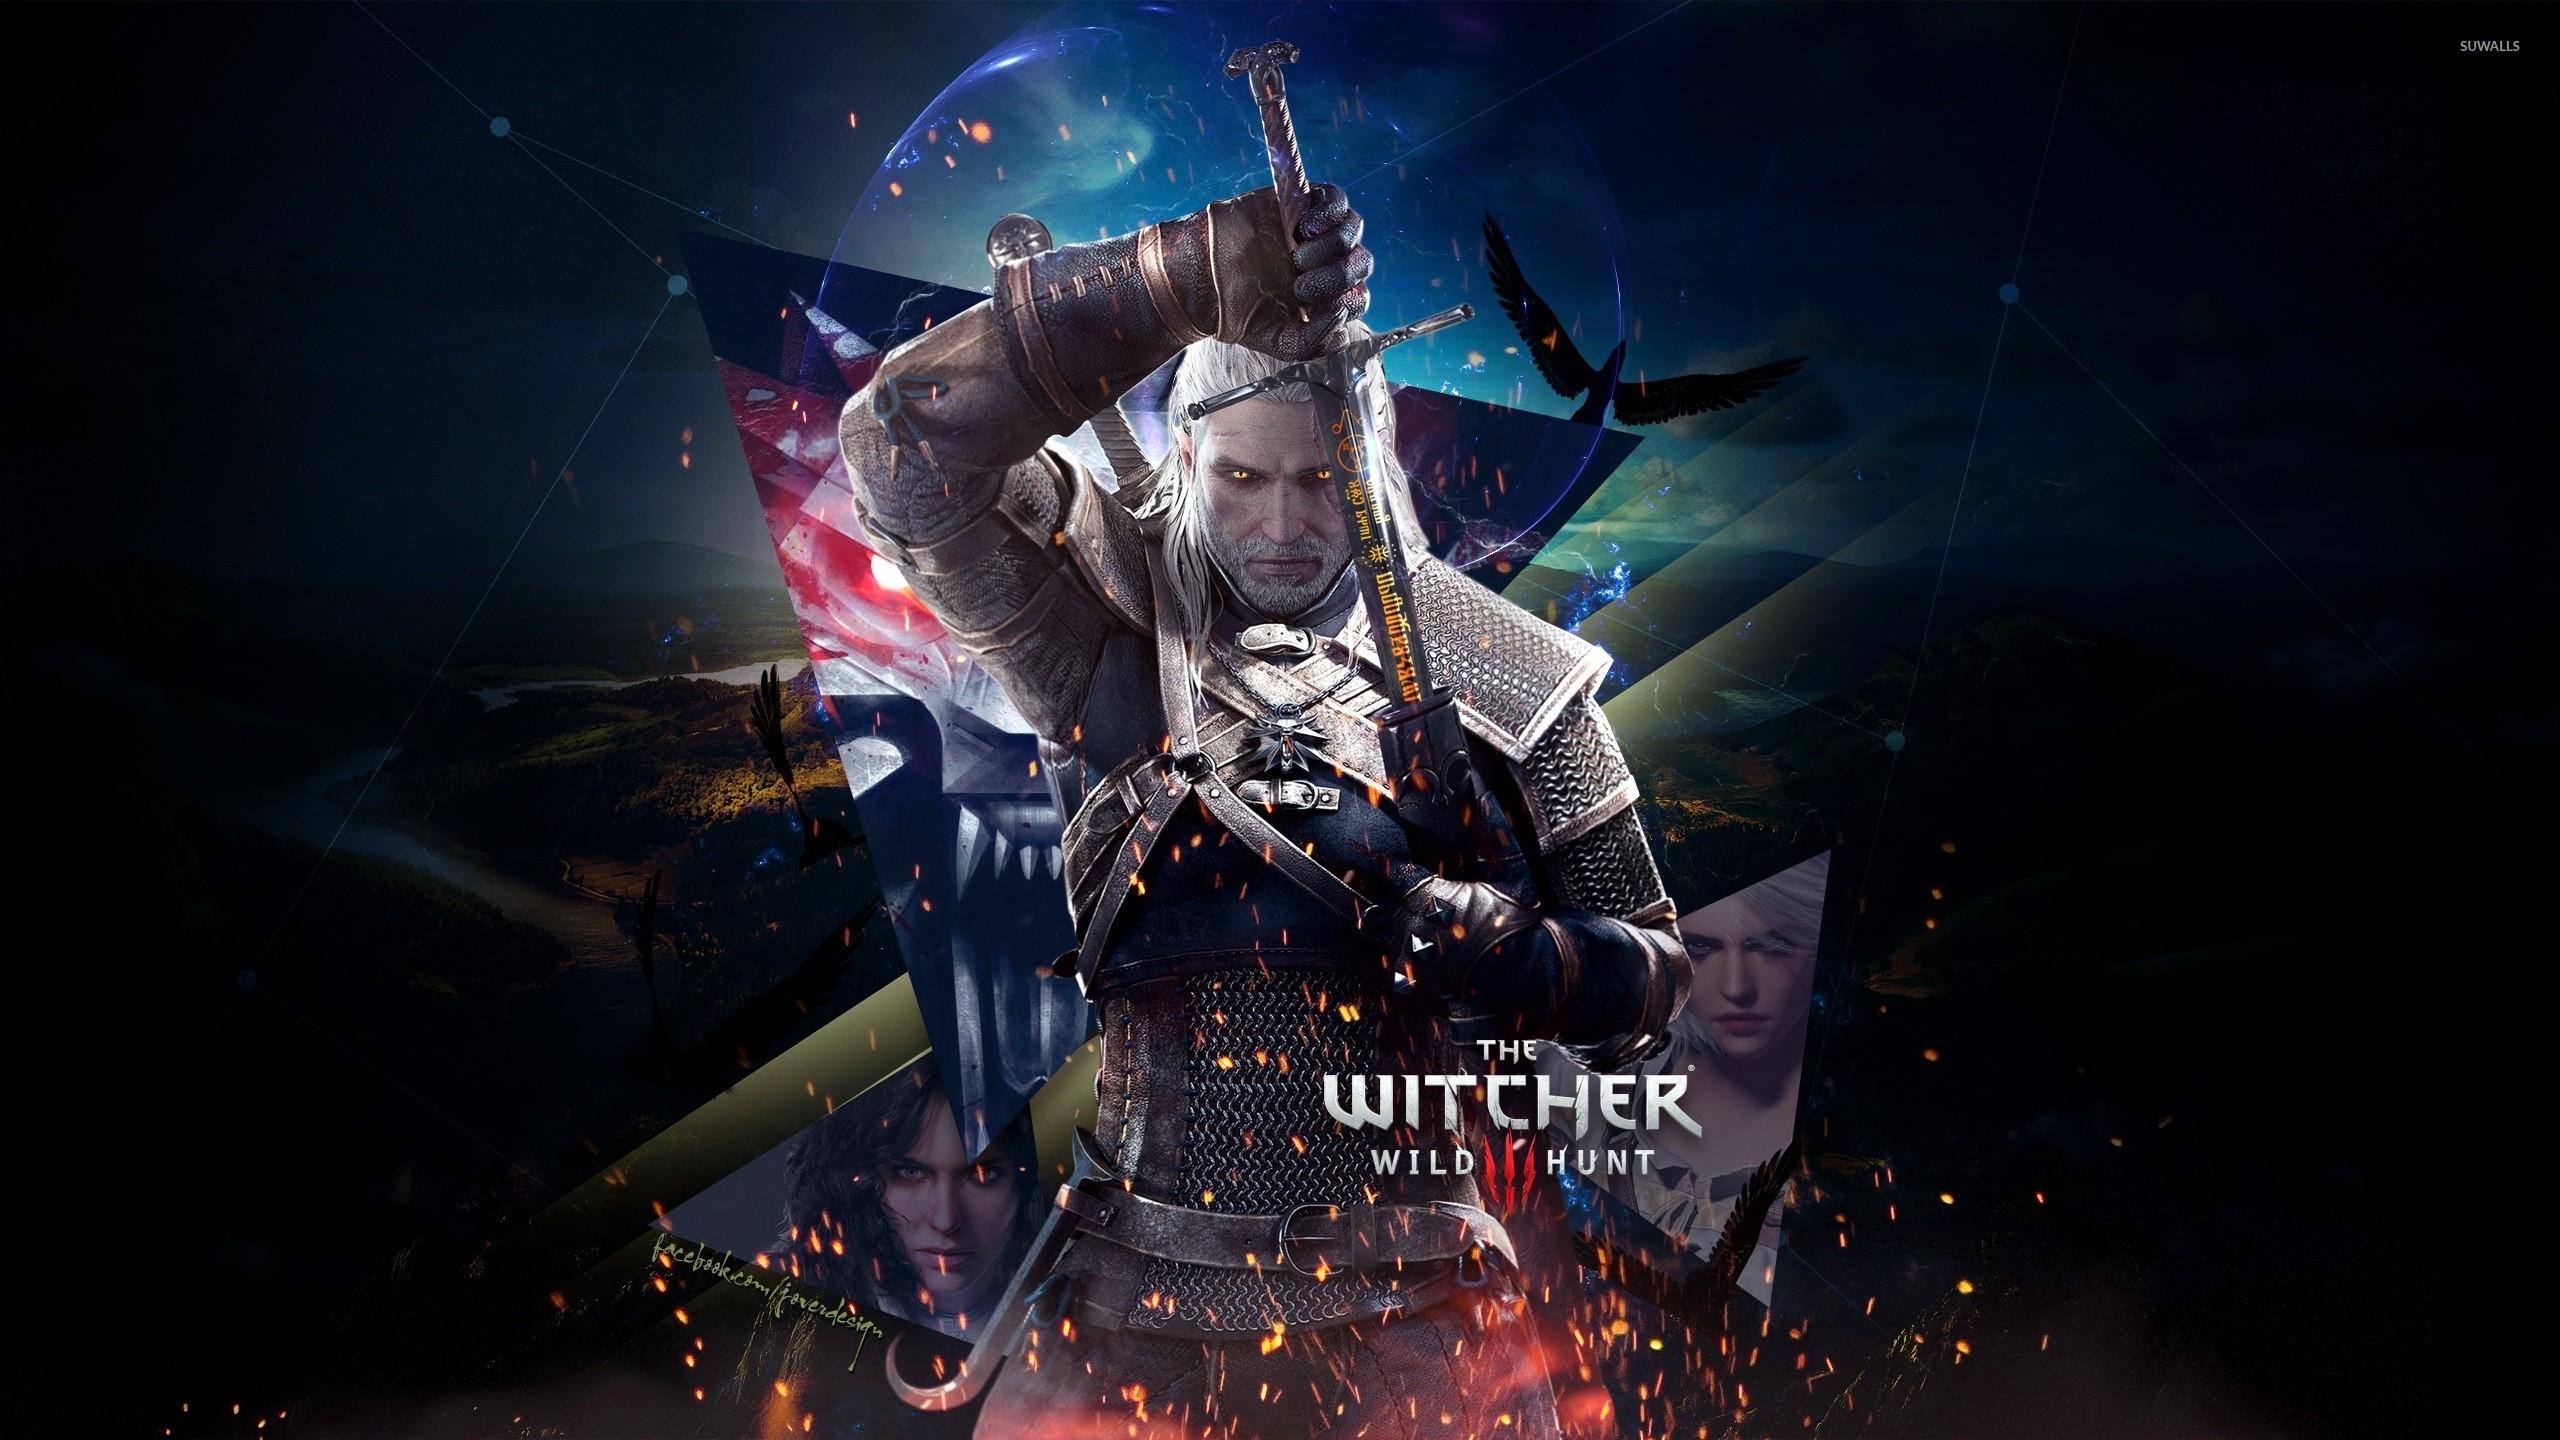 The Witcher 3: Wild Hunt [6] wallpaper jpg